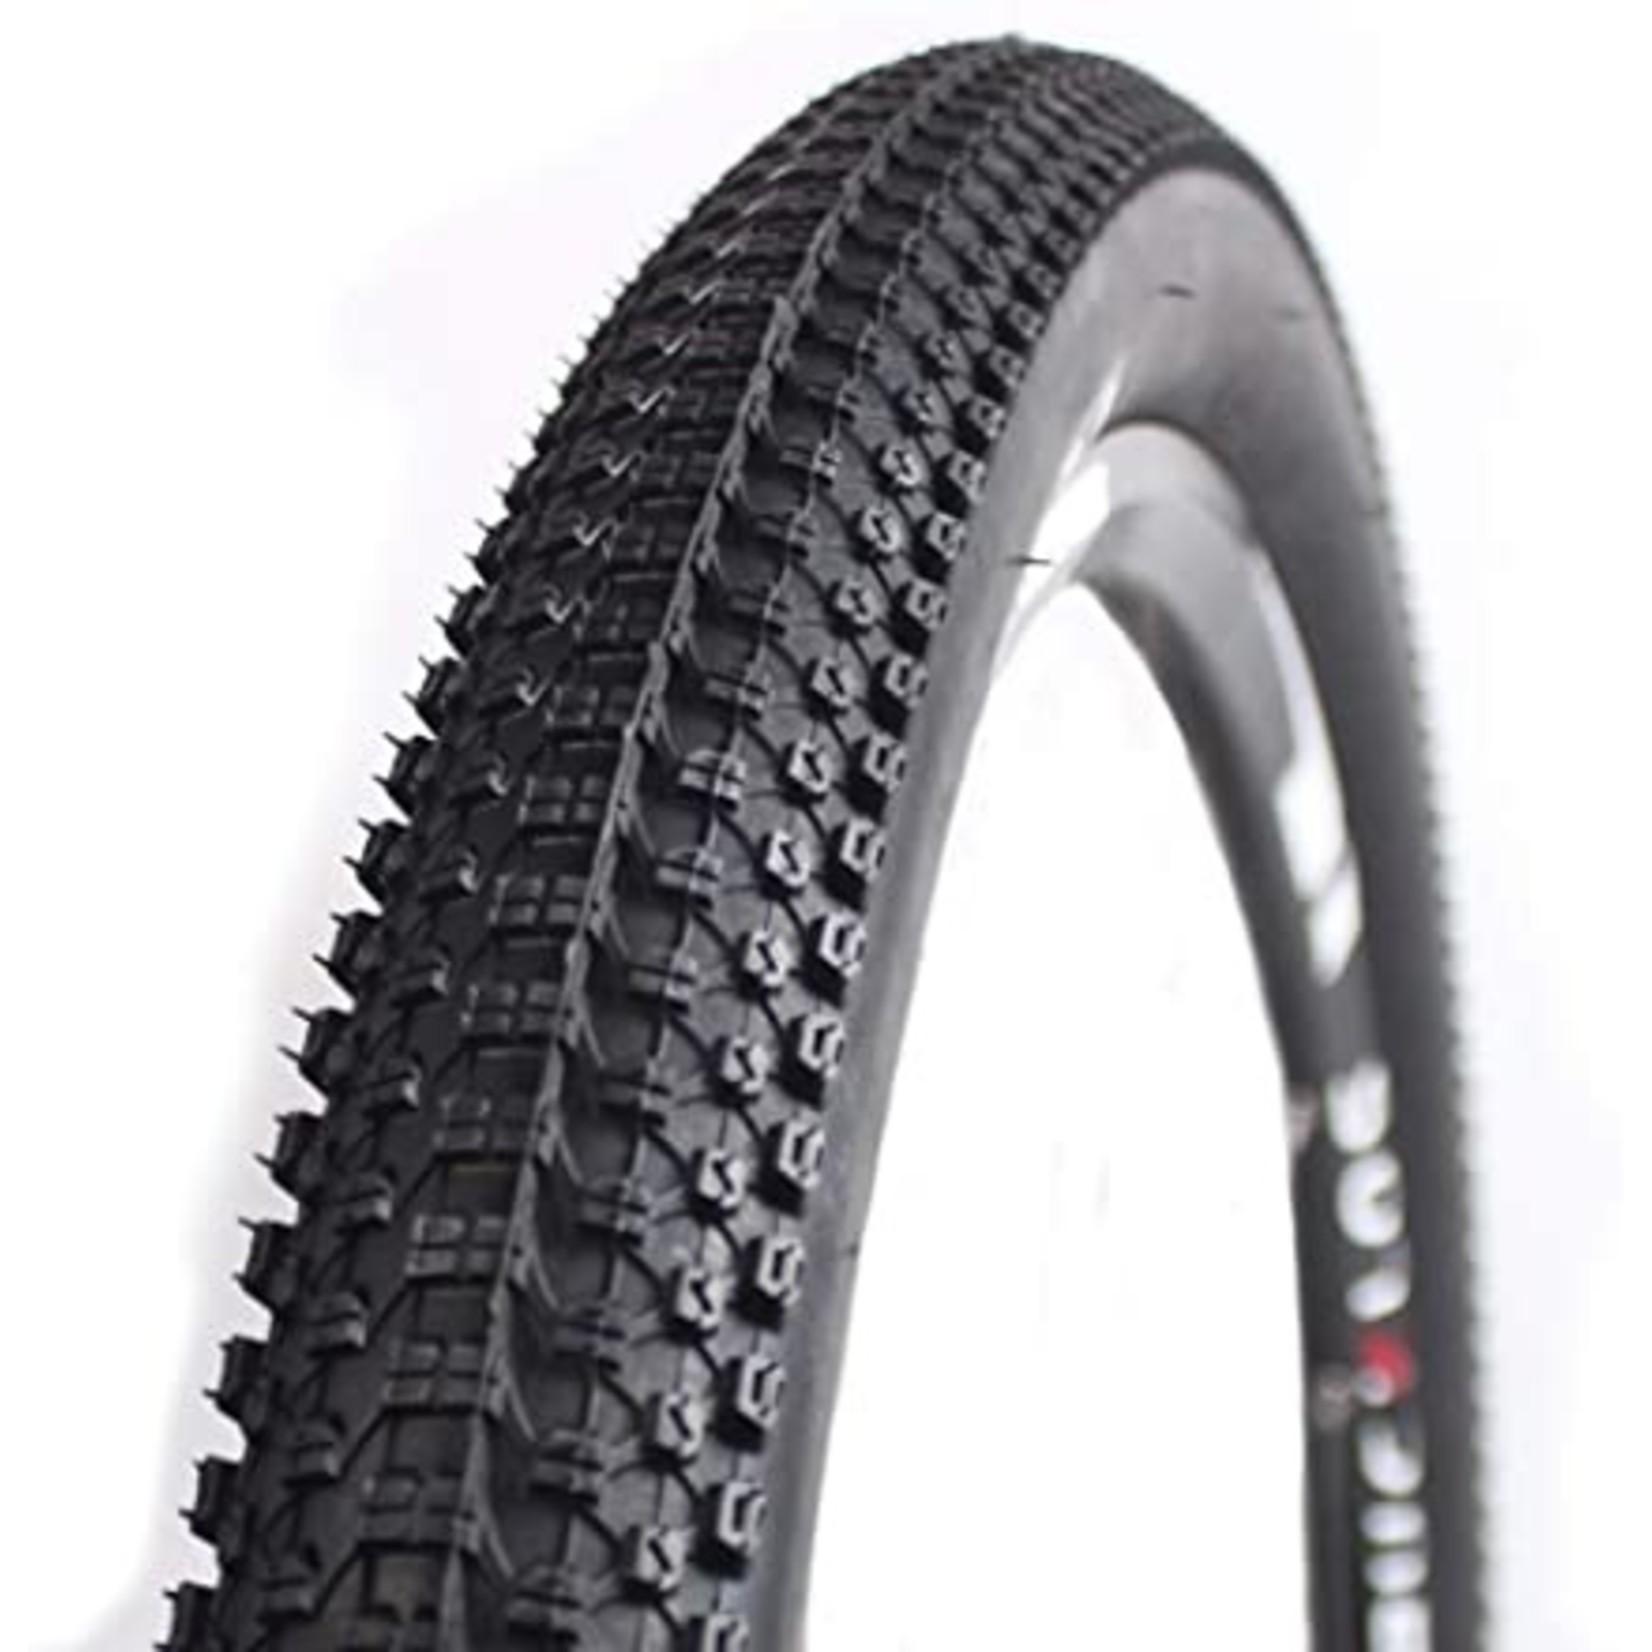 Kenda K1047 Small Block 8 26x2.1 Wire Bead Tire